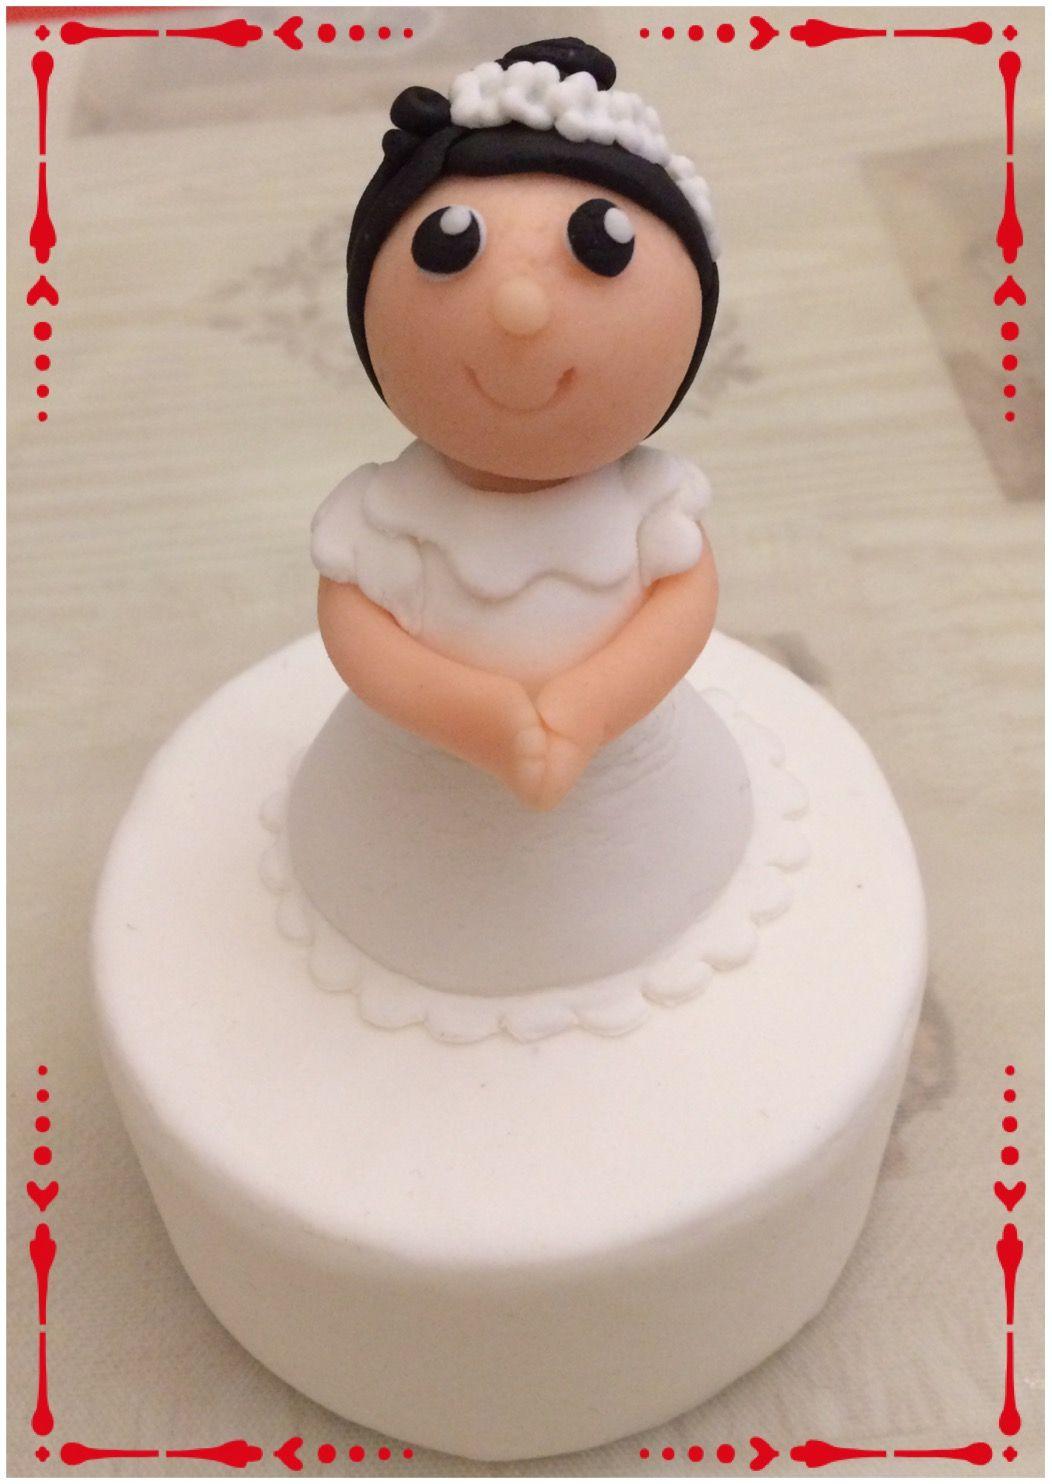 First communion - little girl | Cake toppers | Pinterest ...